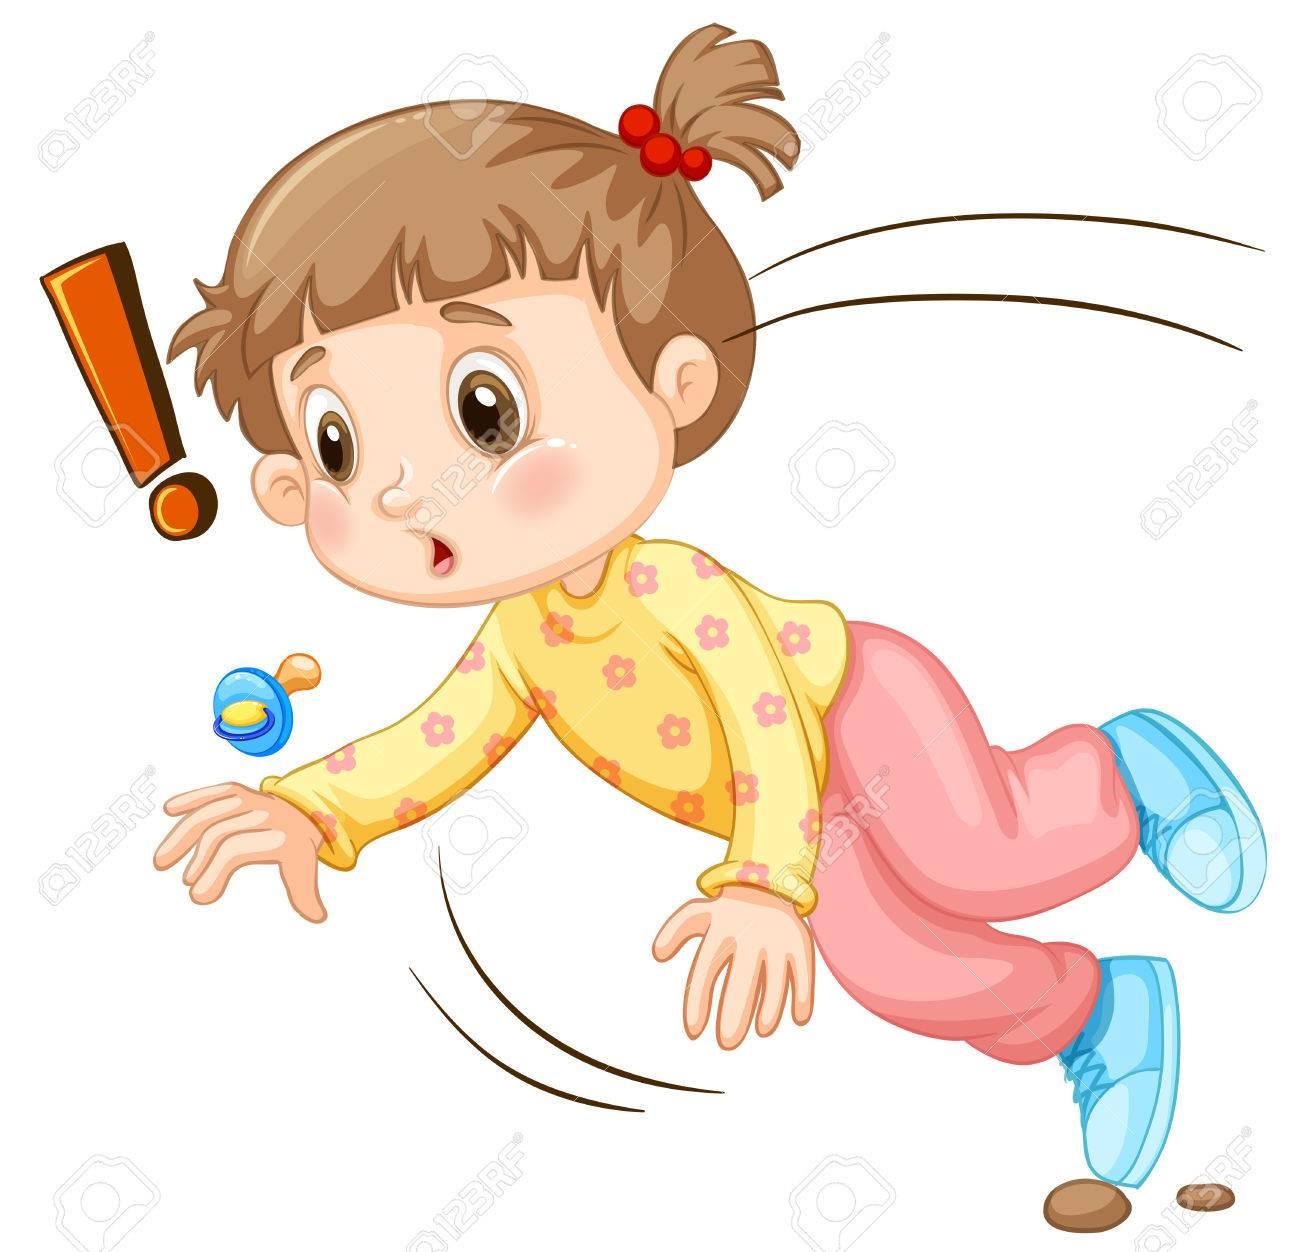 hight resolution of little girl falling down illustration stock vector 53963340